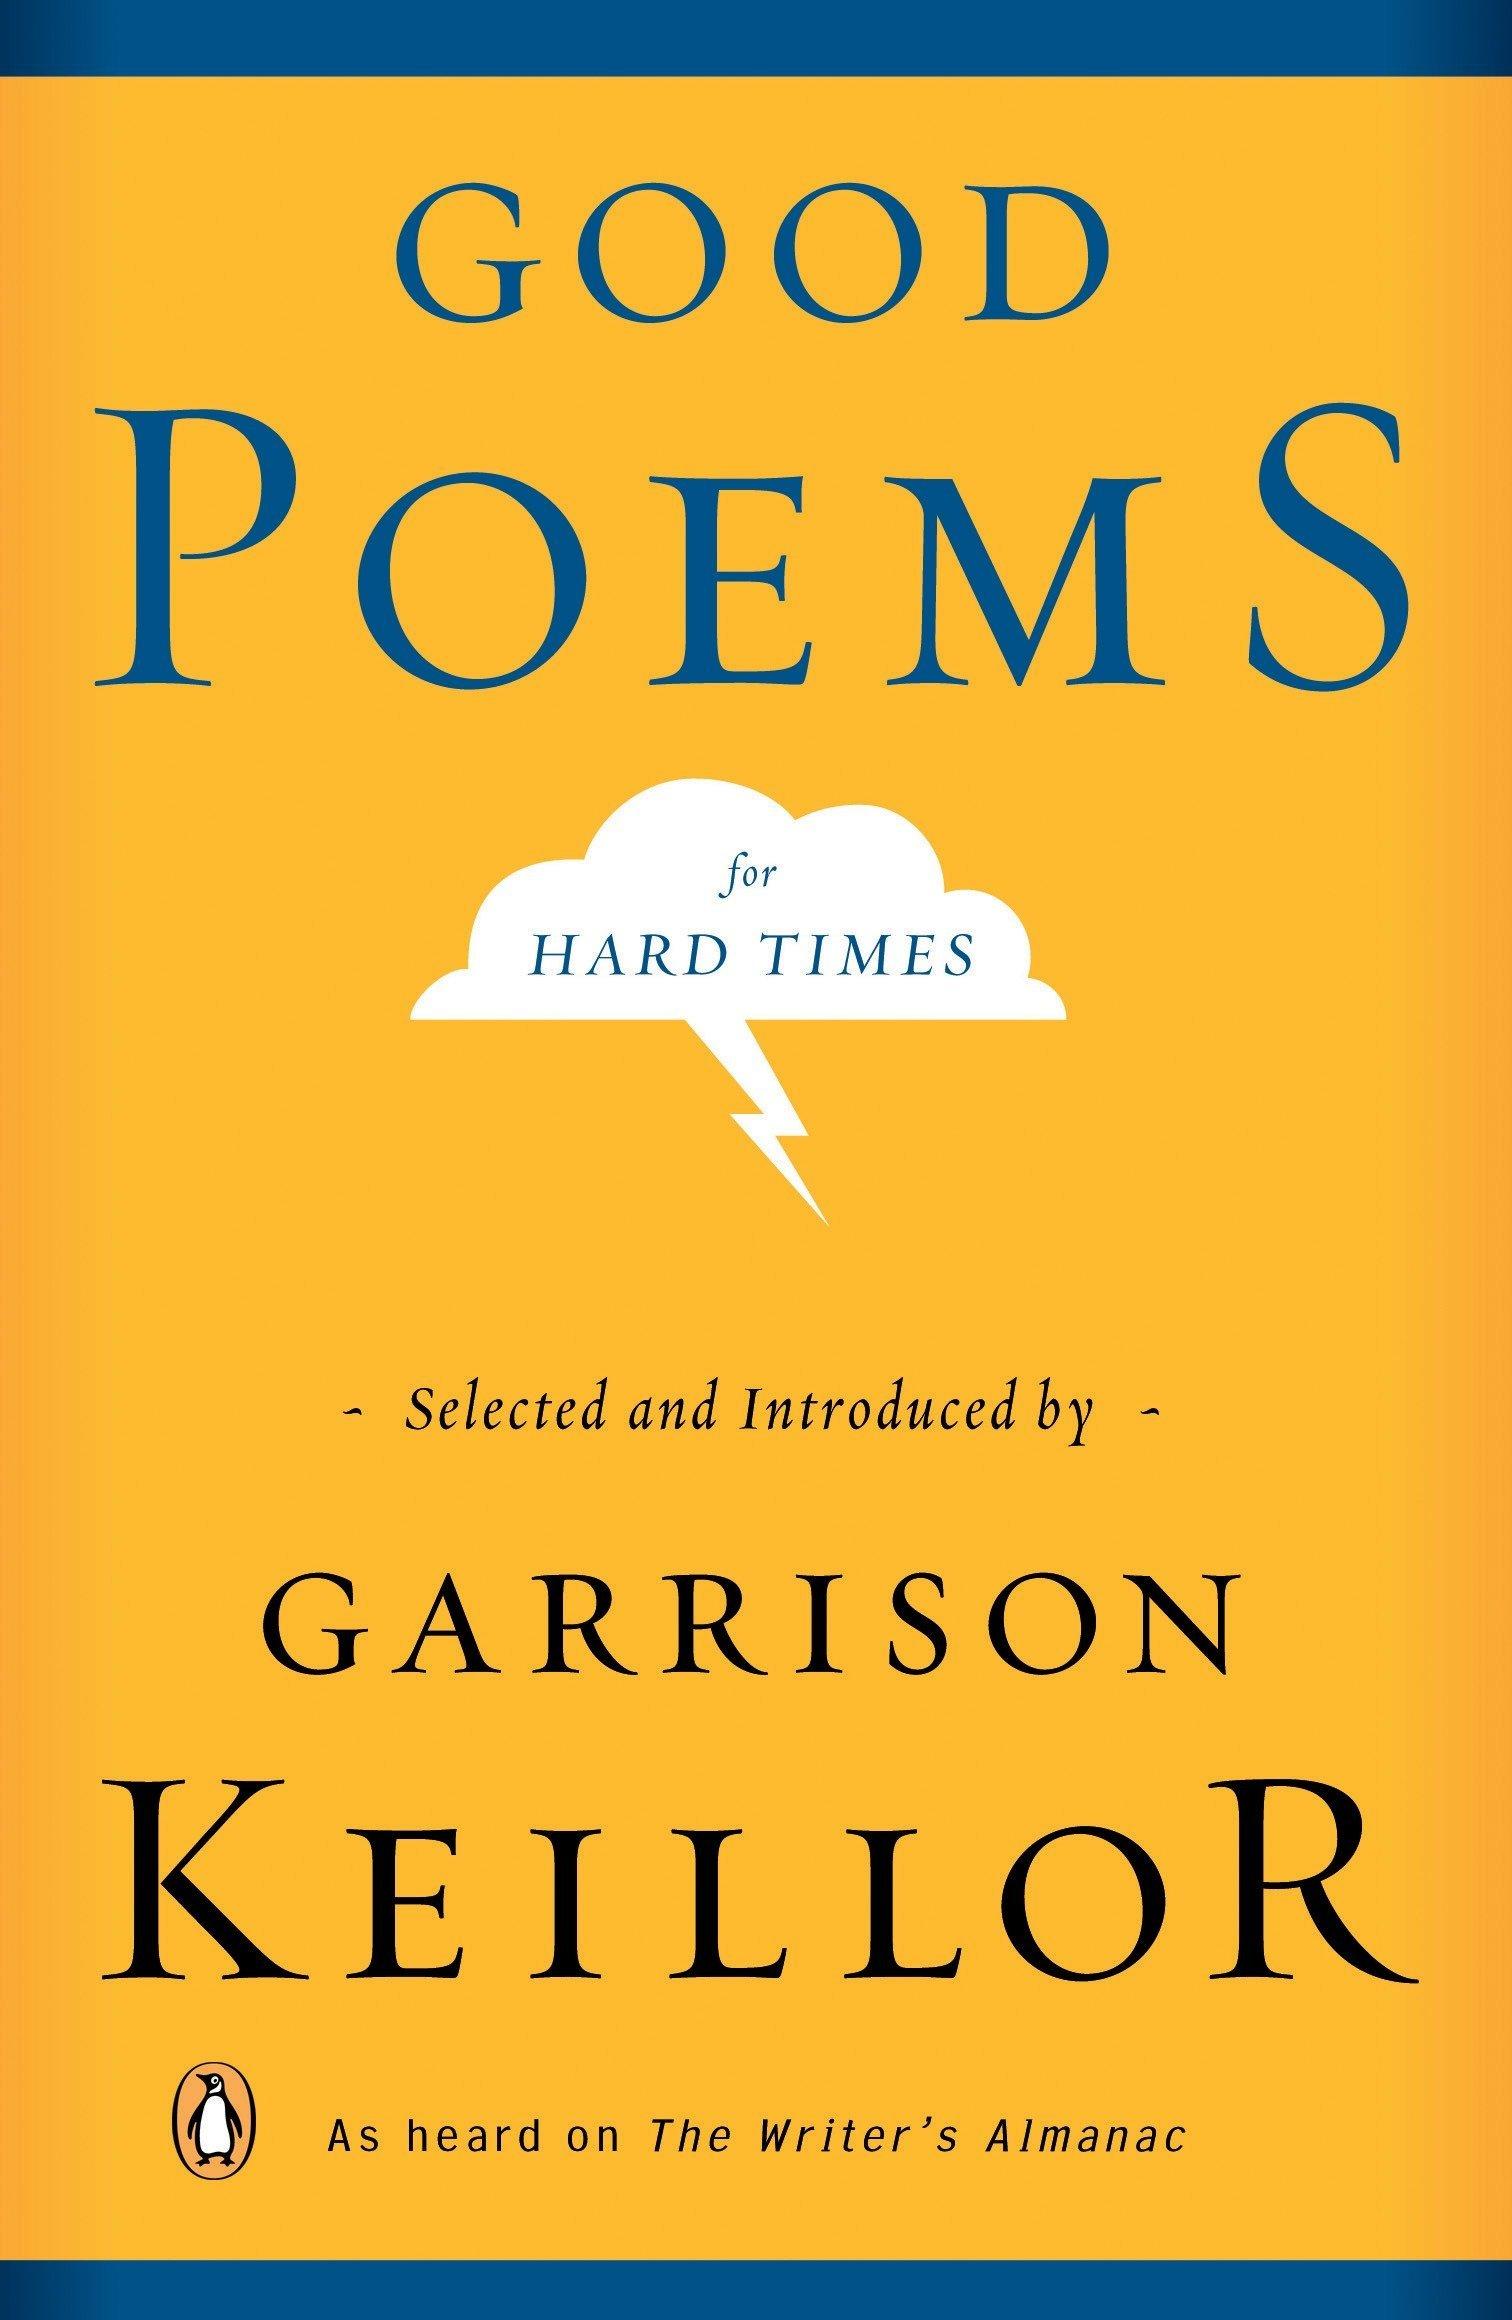 Good Poems for Hard Times: Amazon.co.uk: Garrison Keillor: 9780143037675:  Books